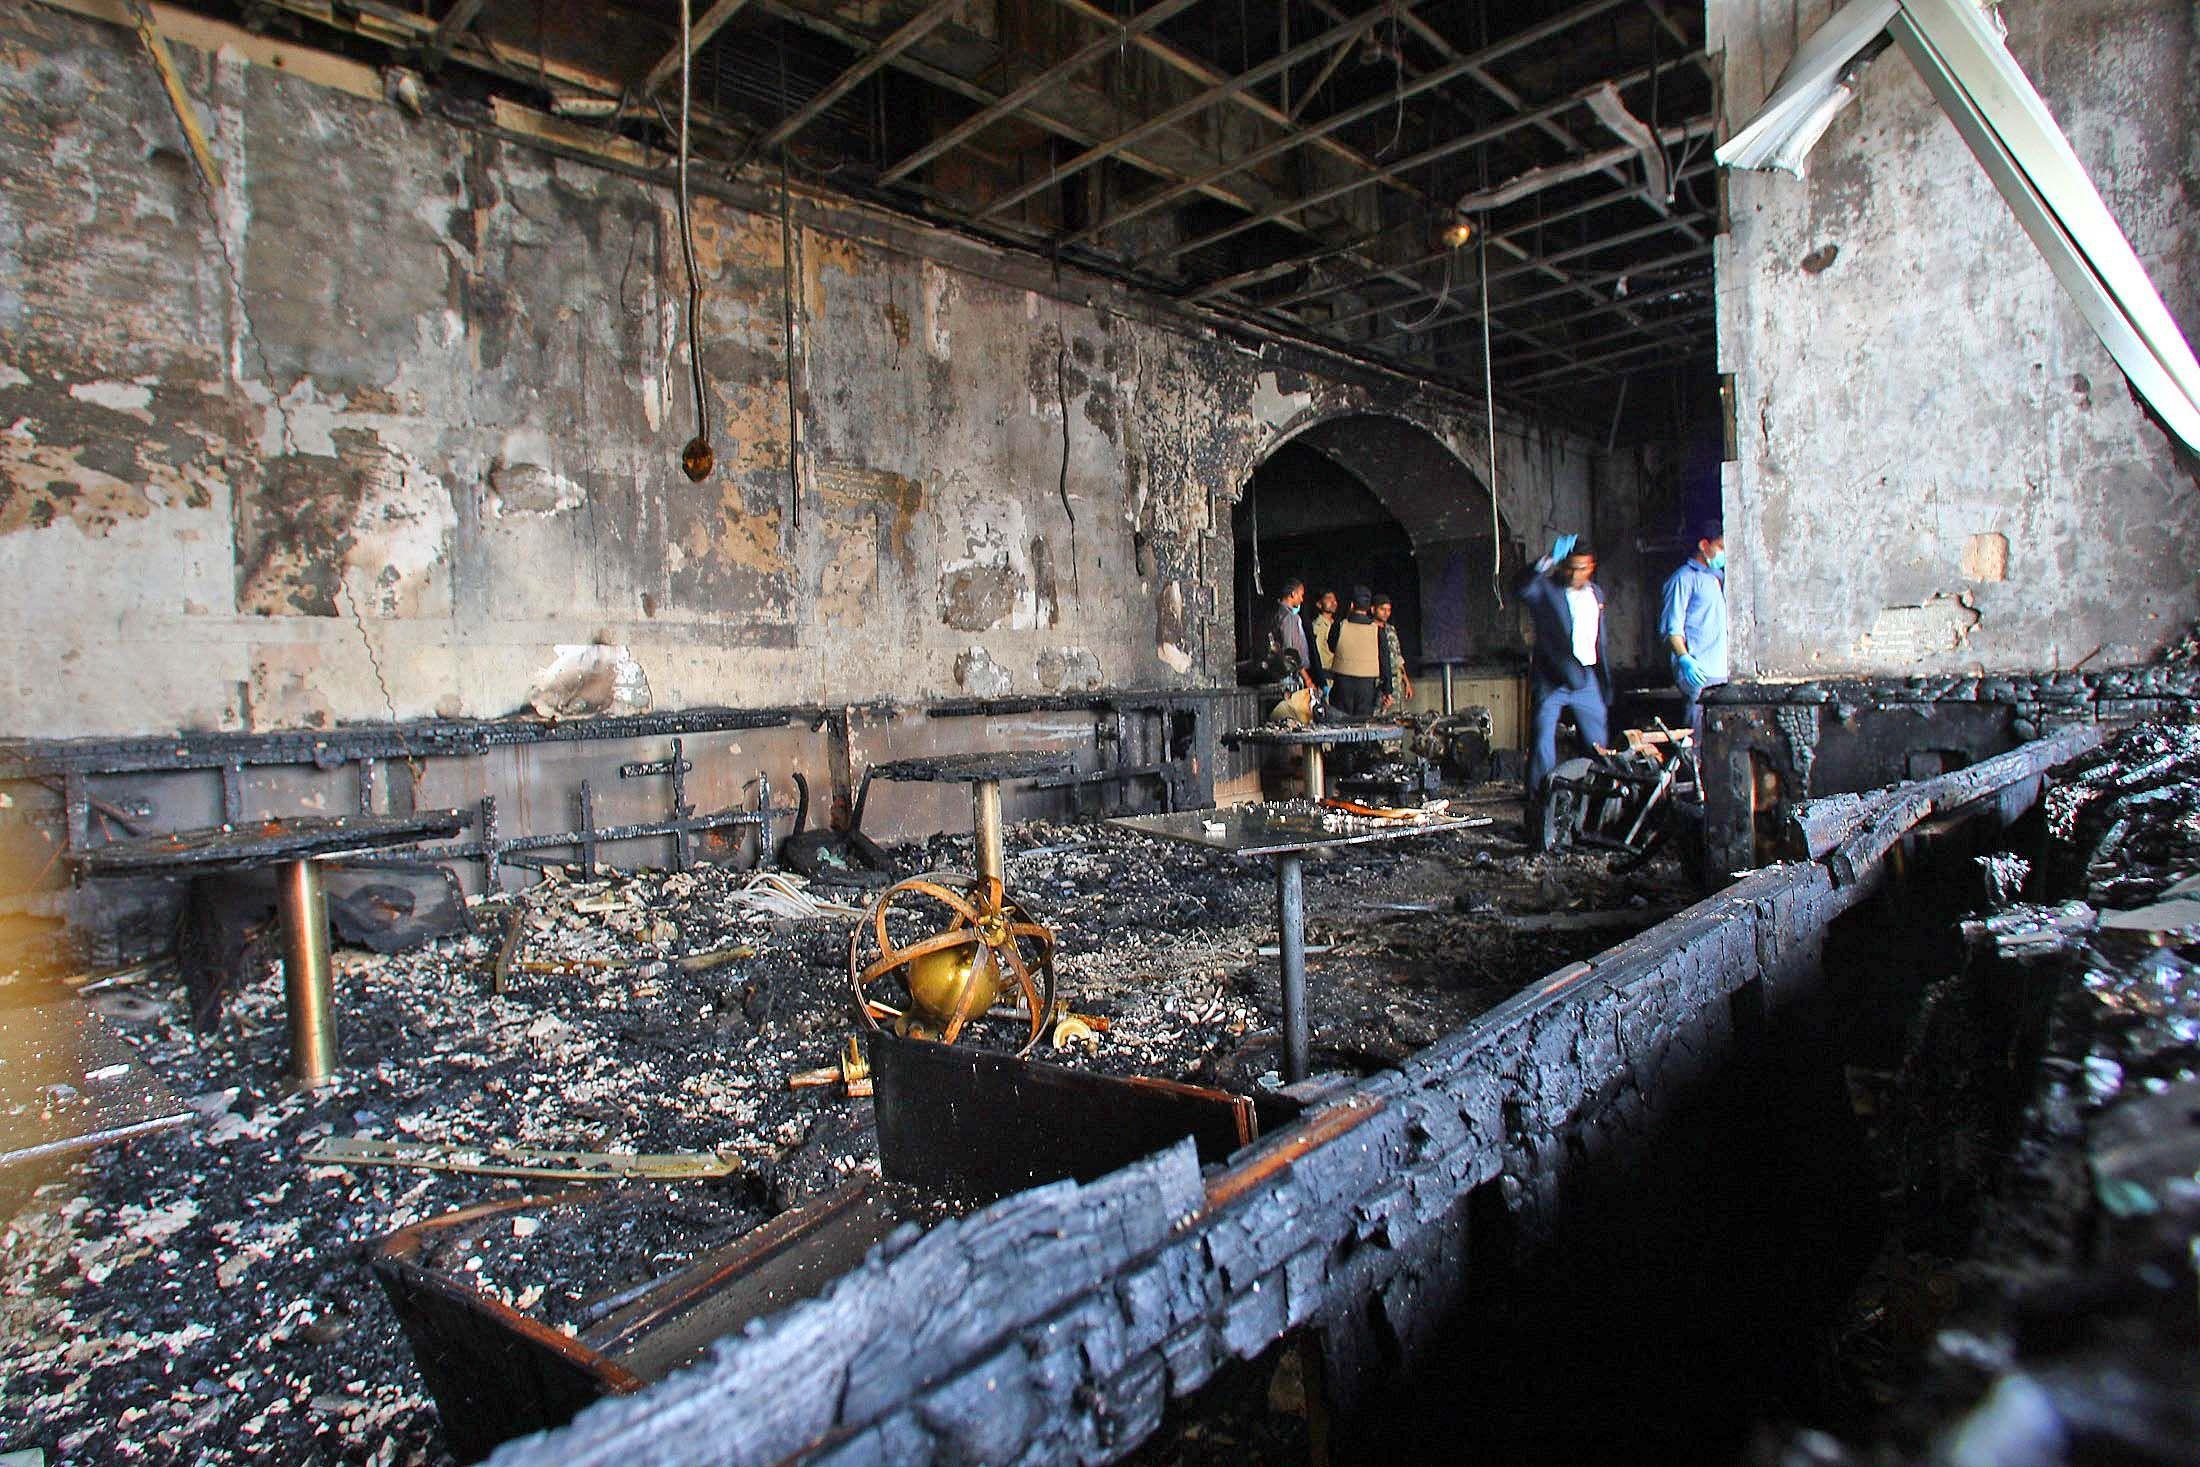 Fire Damage at the Taj Mahal Palace Hotel in Mumbai India